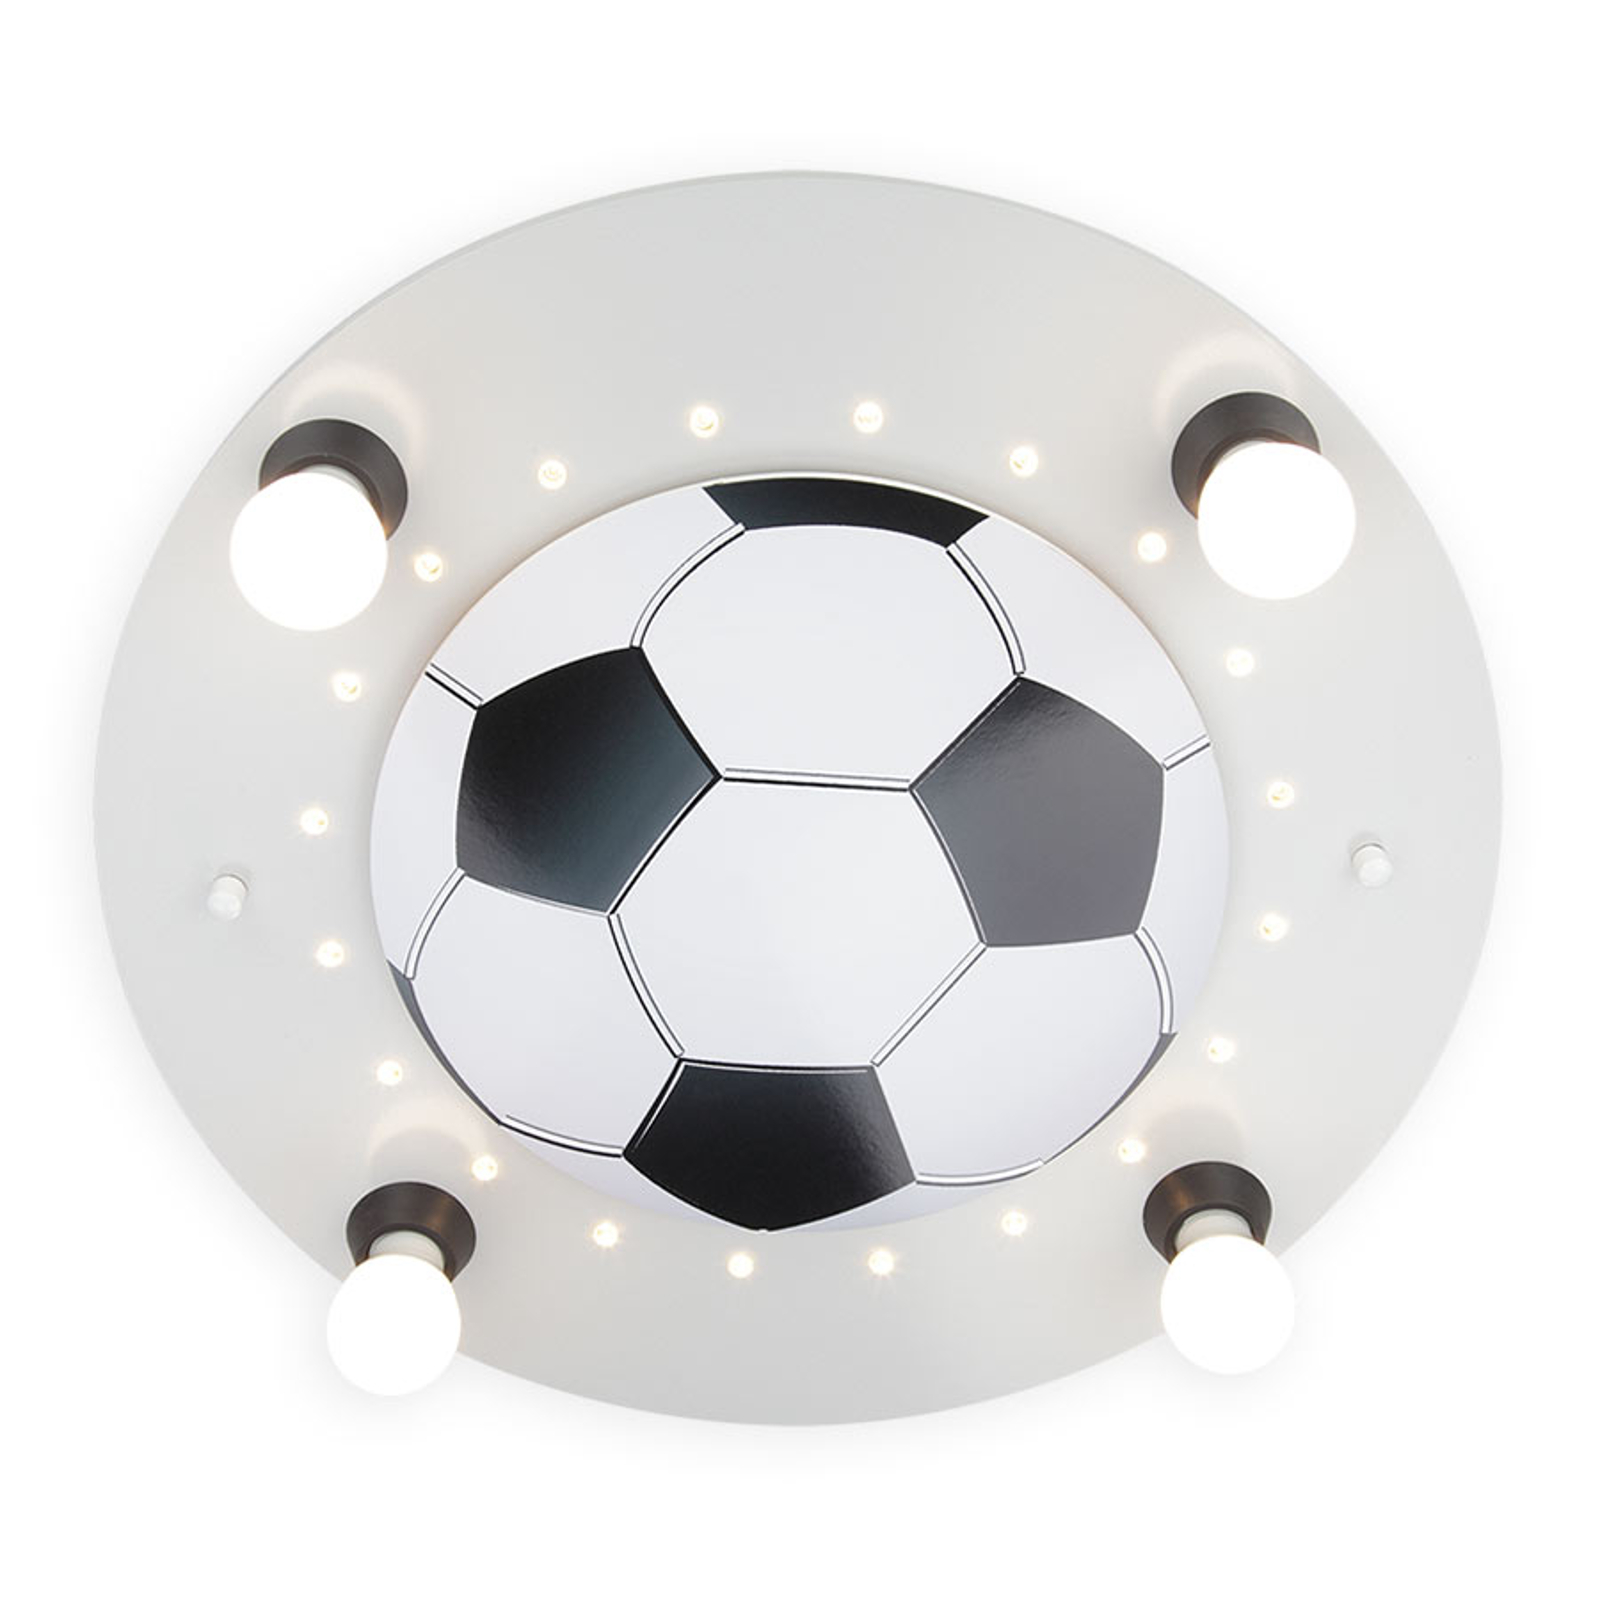 Plafondlamp Voetbal, 4-lamps, zilver-wit